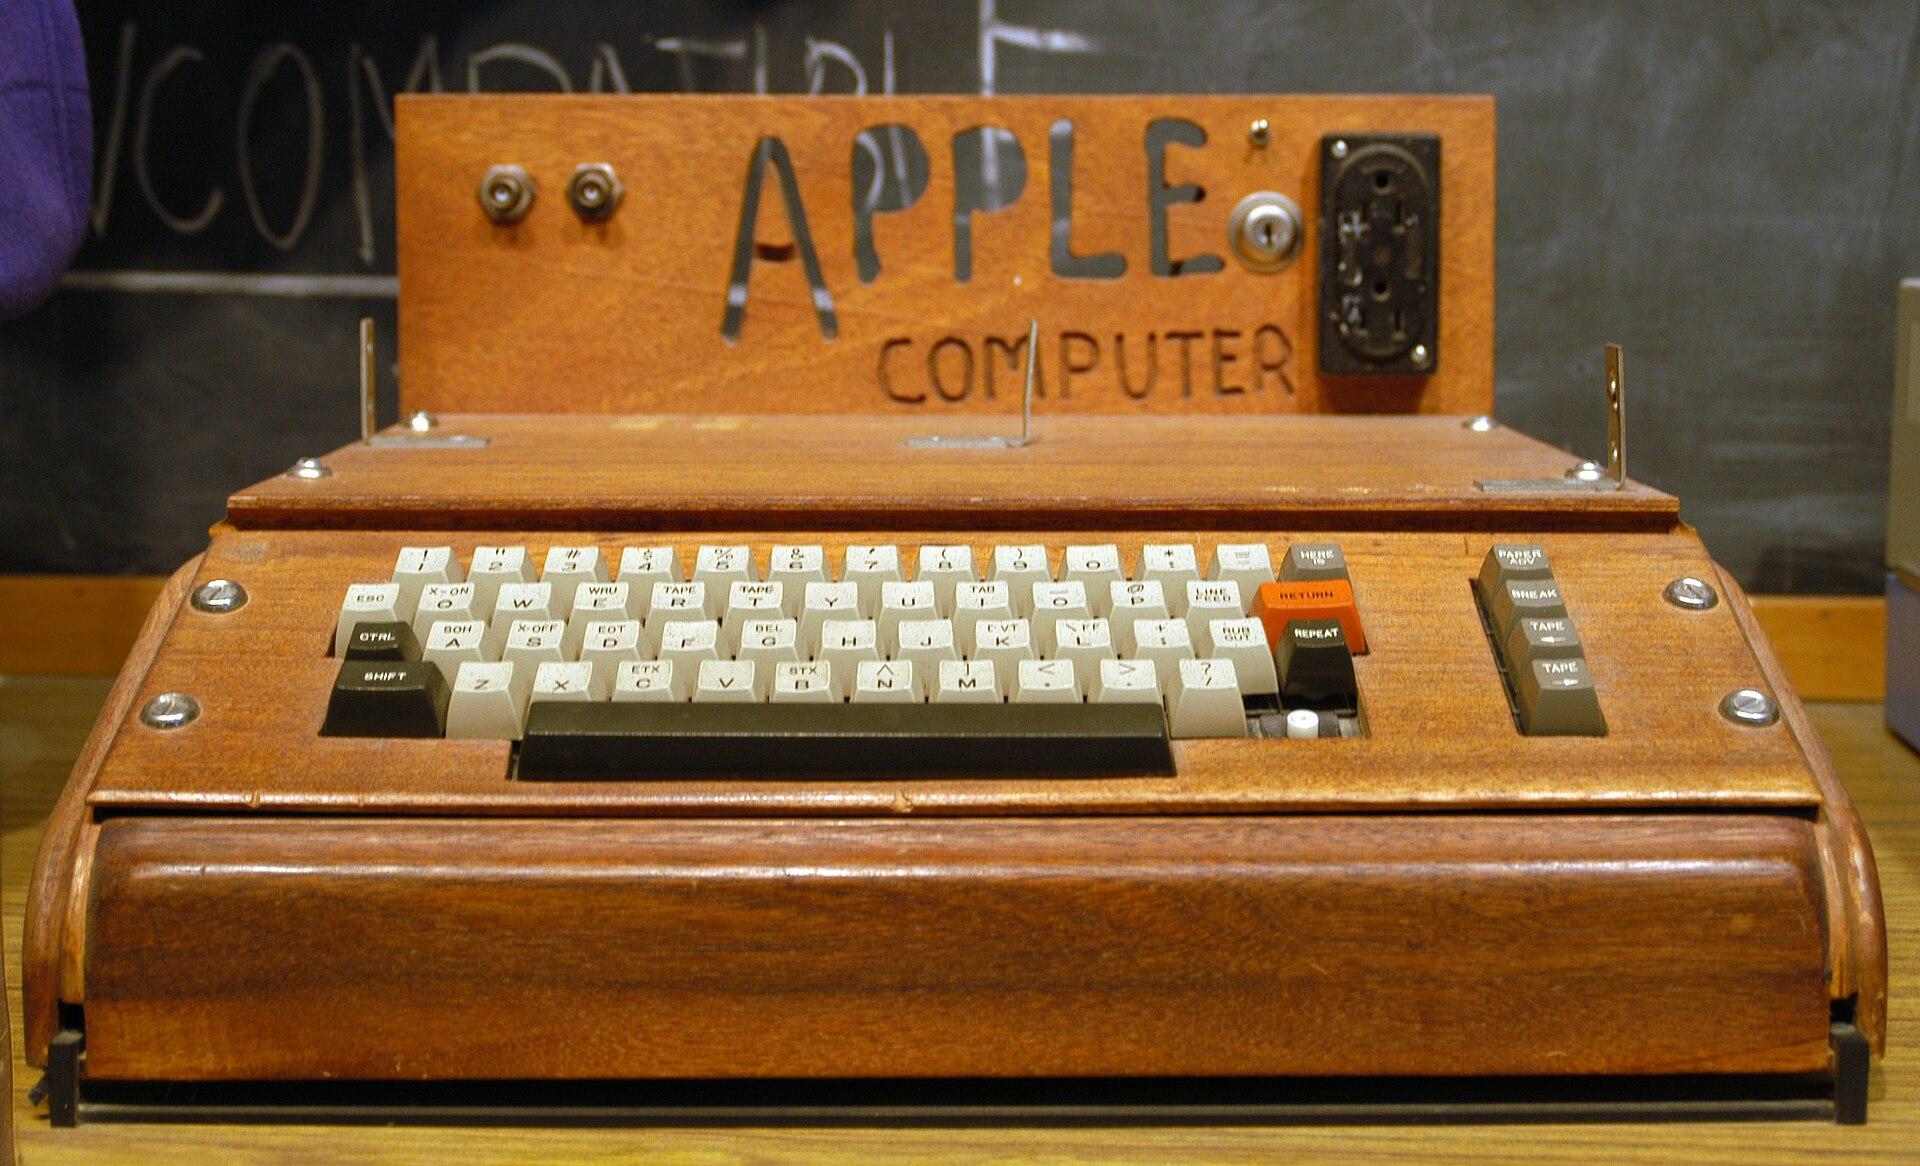 Produk pertama Apple, Apple I, ditemukan oleh salah satu pendiri Apple Steve Wozniak, dijual sebagai papan sirkuit rakitan dan tidak memiliki fitur dasar seperti keyboard, monitor, dan kasing. Pemilik unit ini menambahkan keyboard dan kotak kayu.